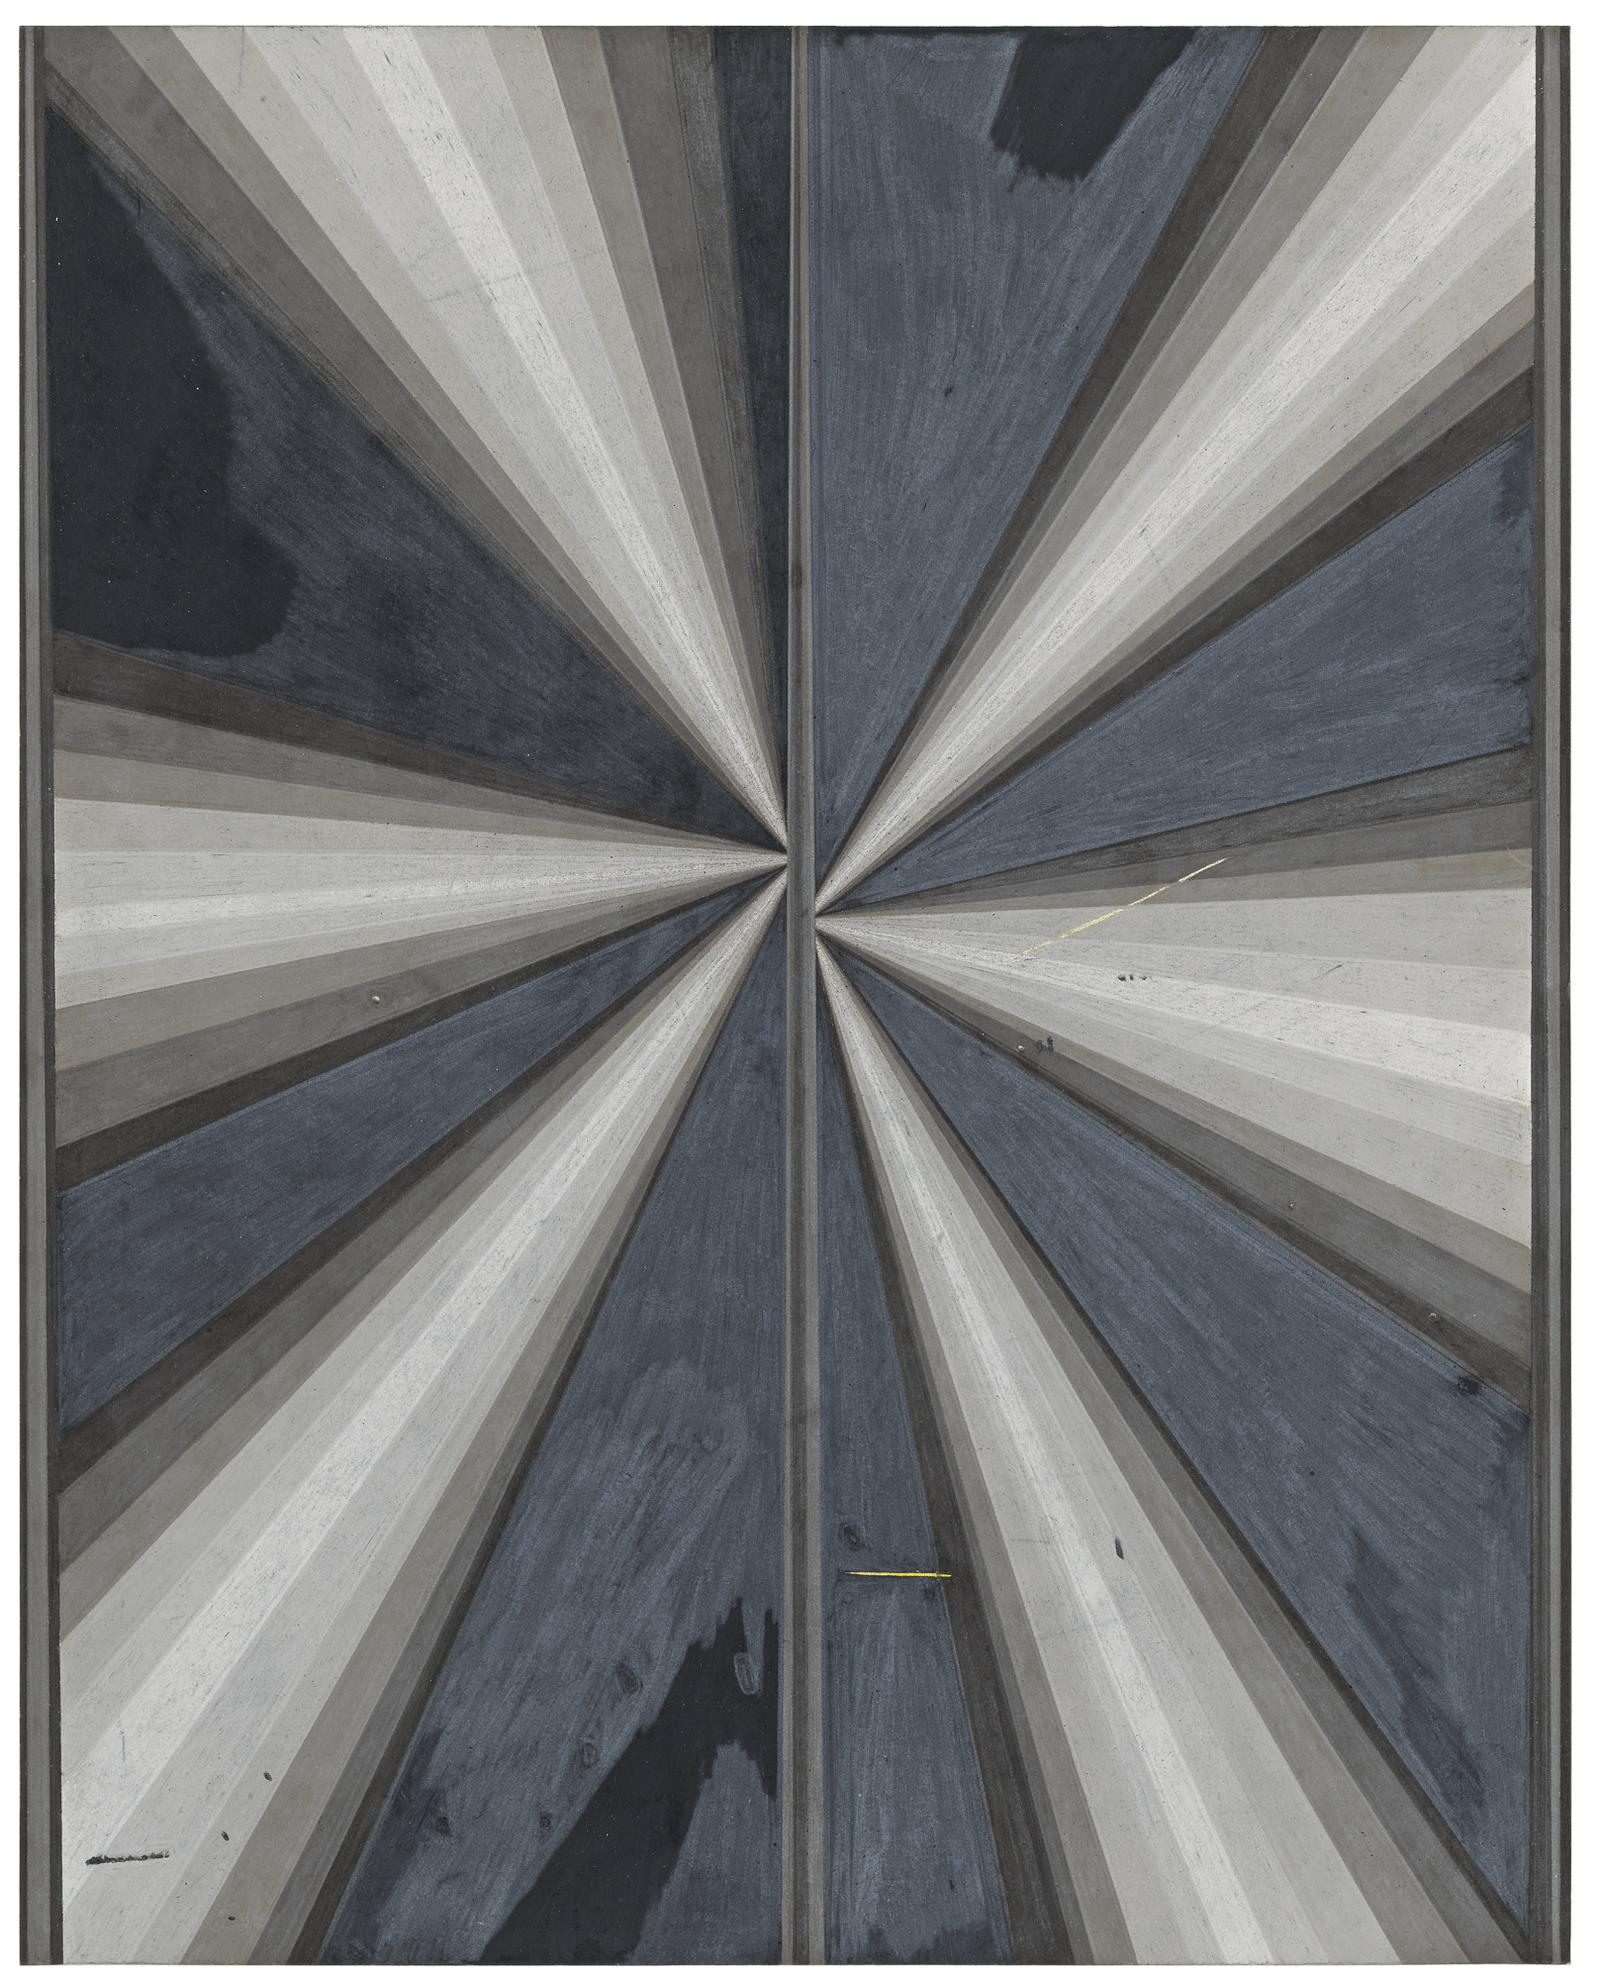 Mark Grotjahn-Untitled (French Grey Fan 10-90% Butterfly With Warm Grey 90% Between #715)-2008